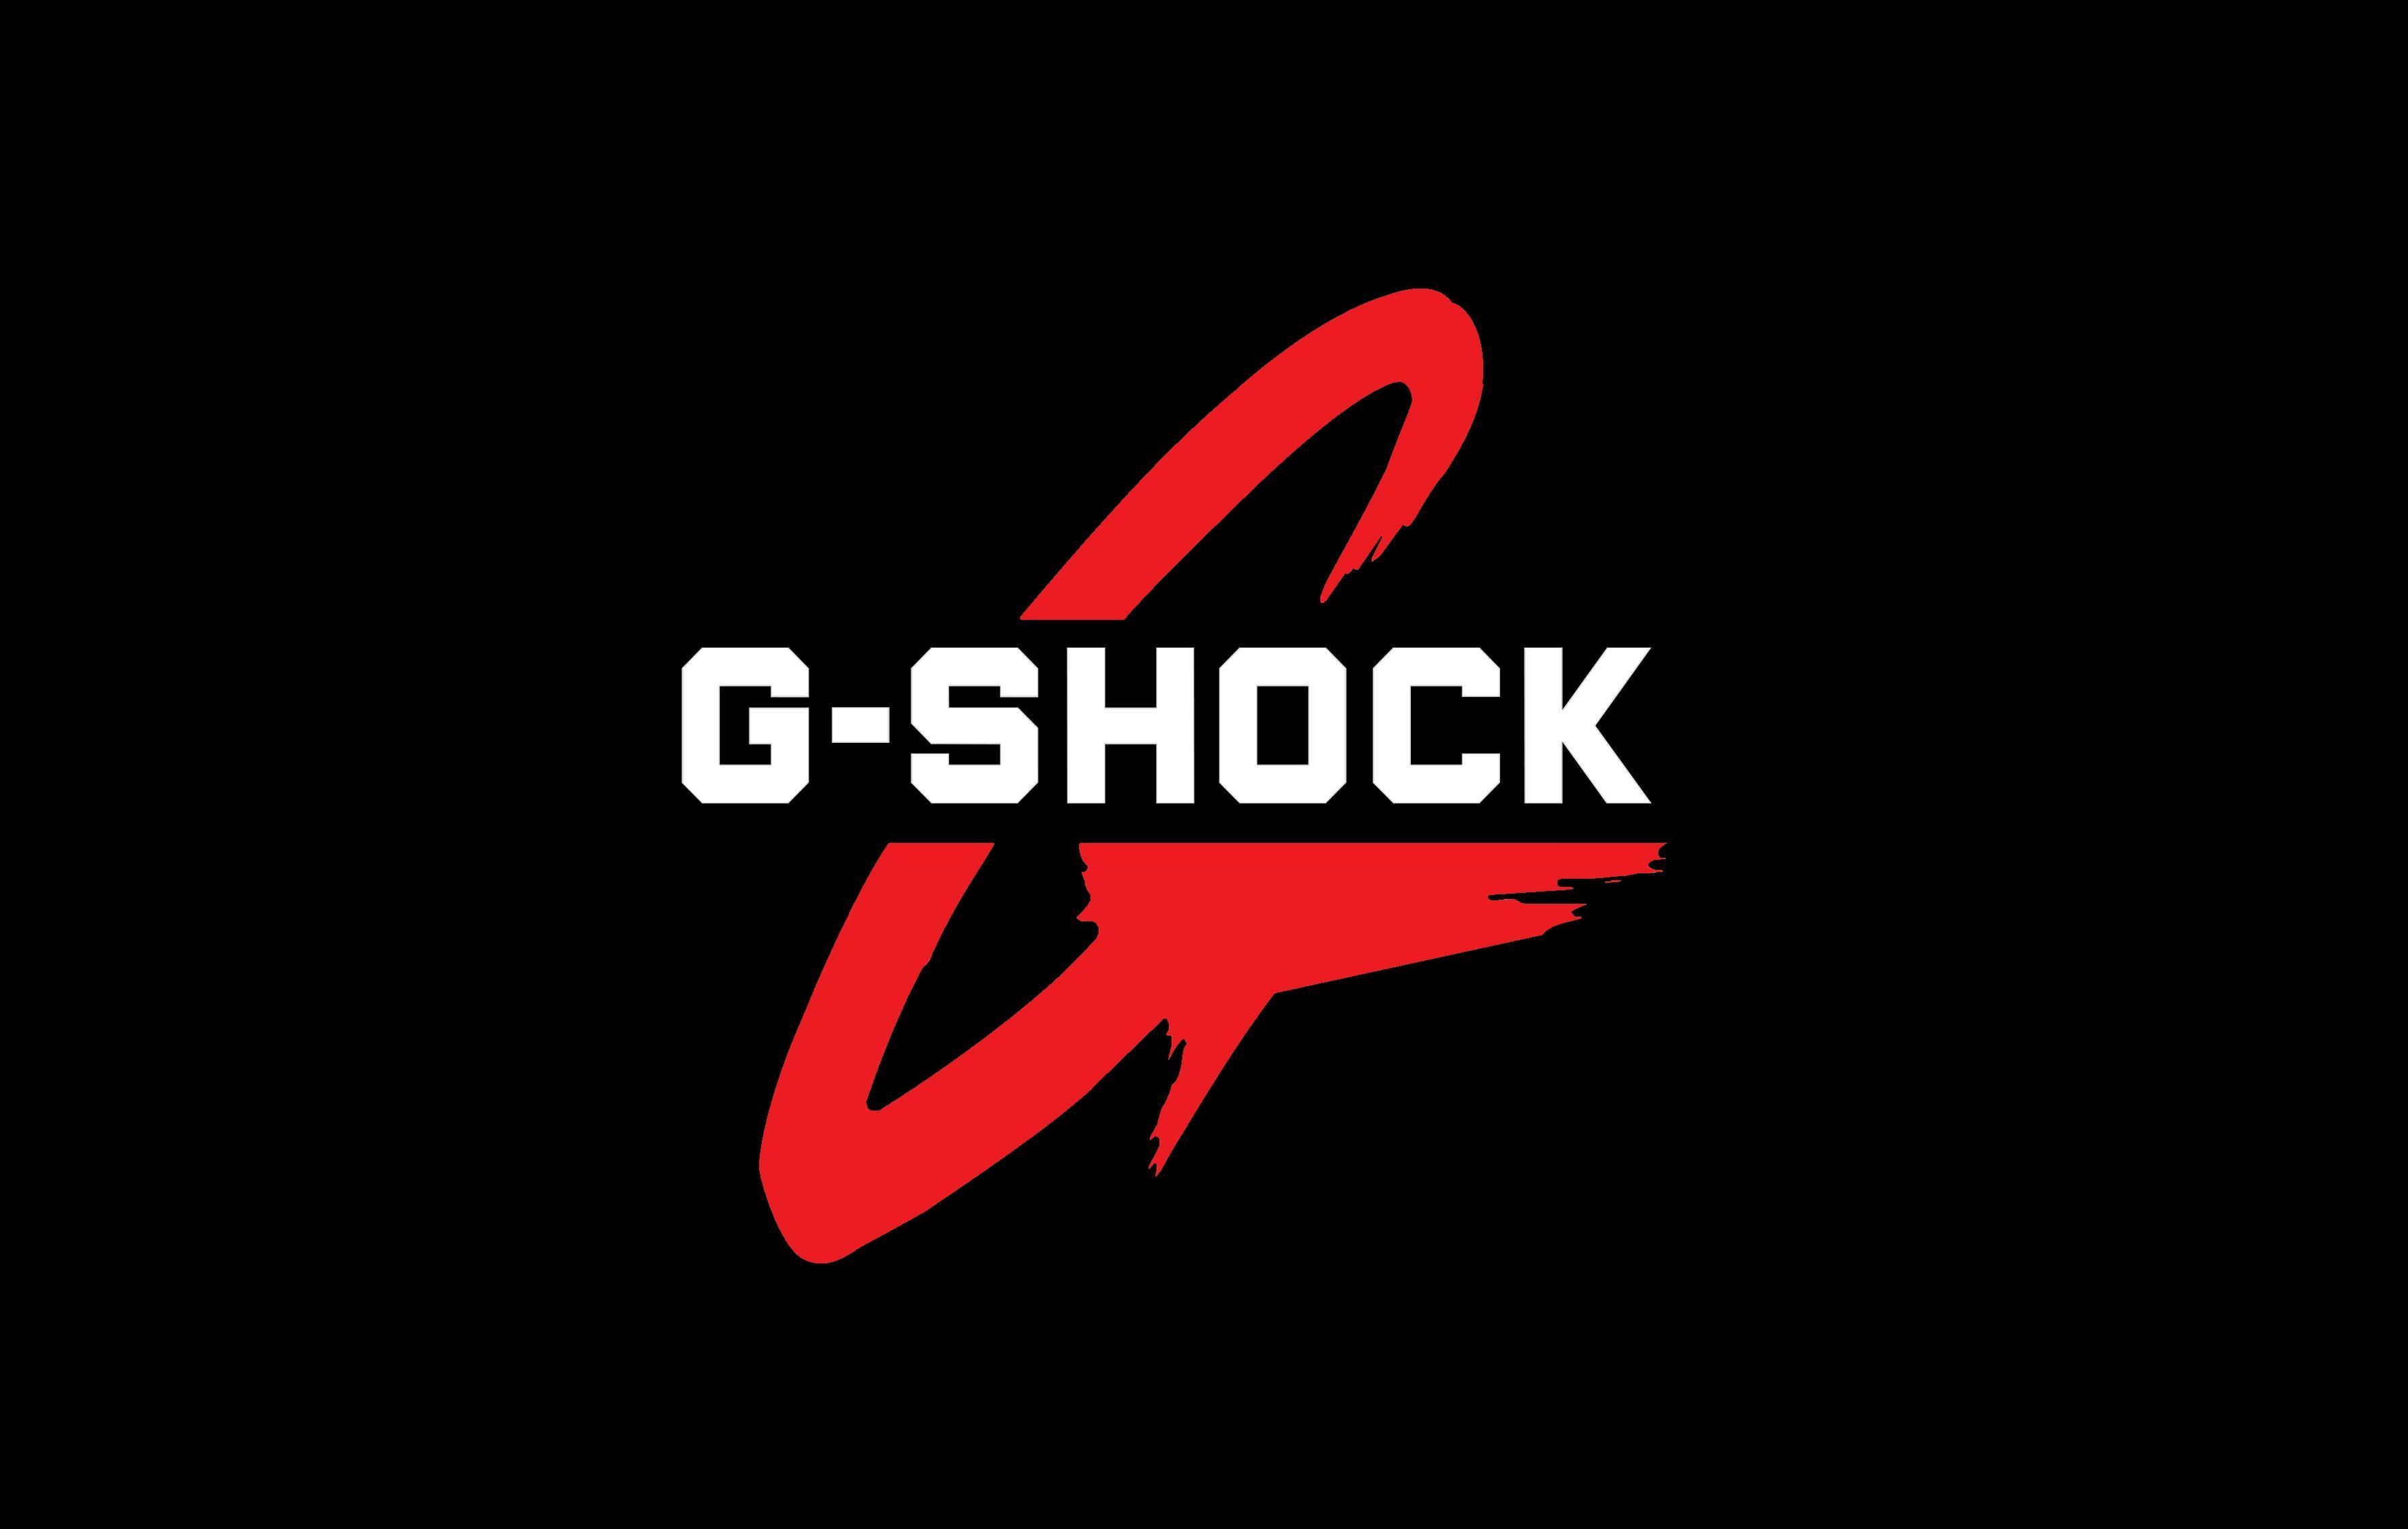 G-SHOCK Wallpaper